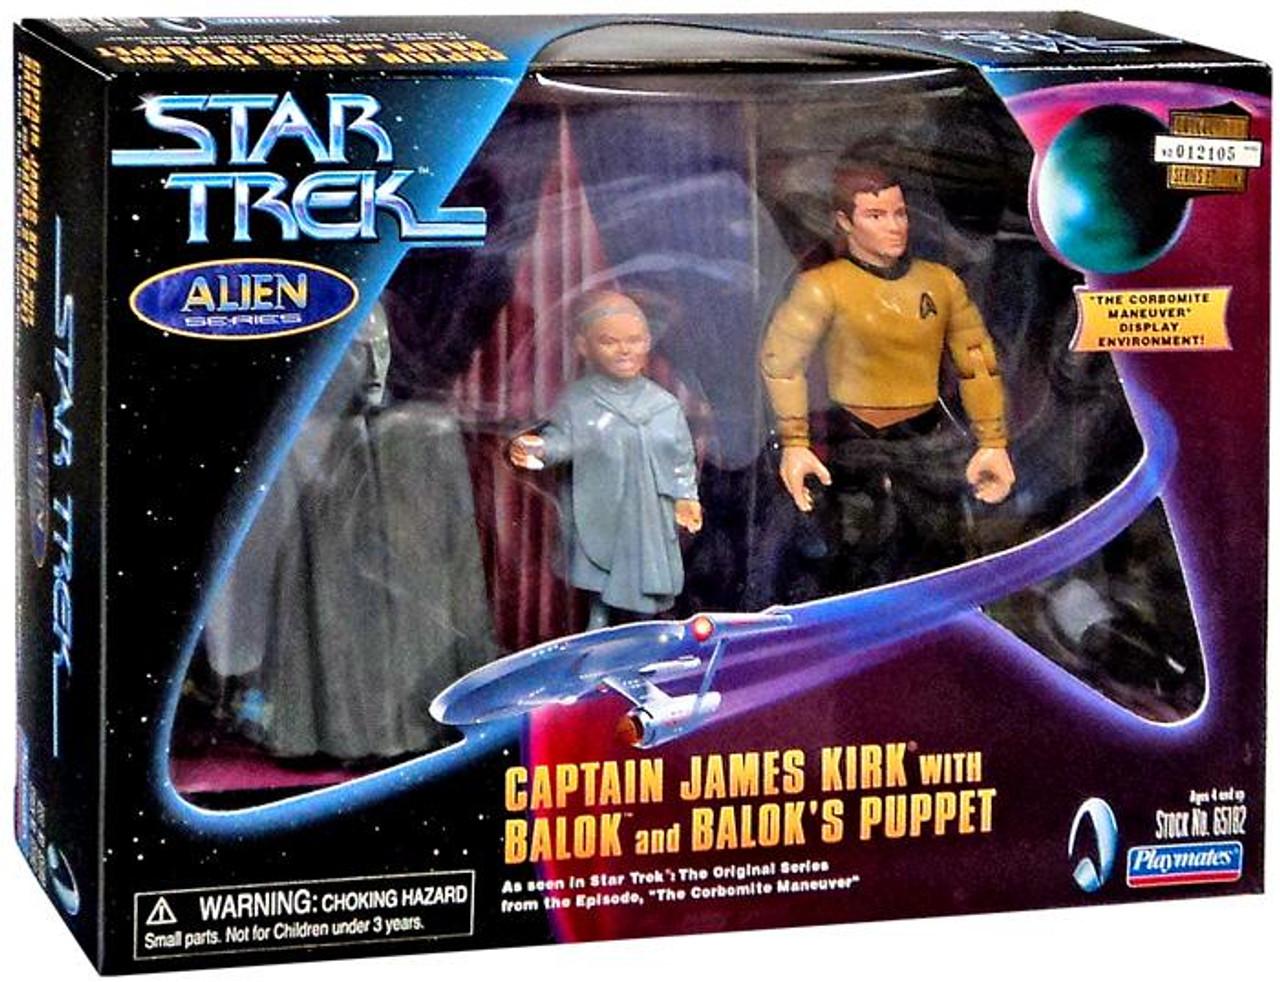 Star Trek The Original Series Captain James Kirk with Balok & Balok's Puppet Action Figure 3-Pack